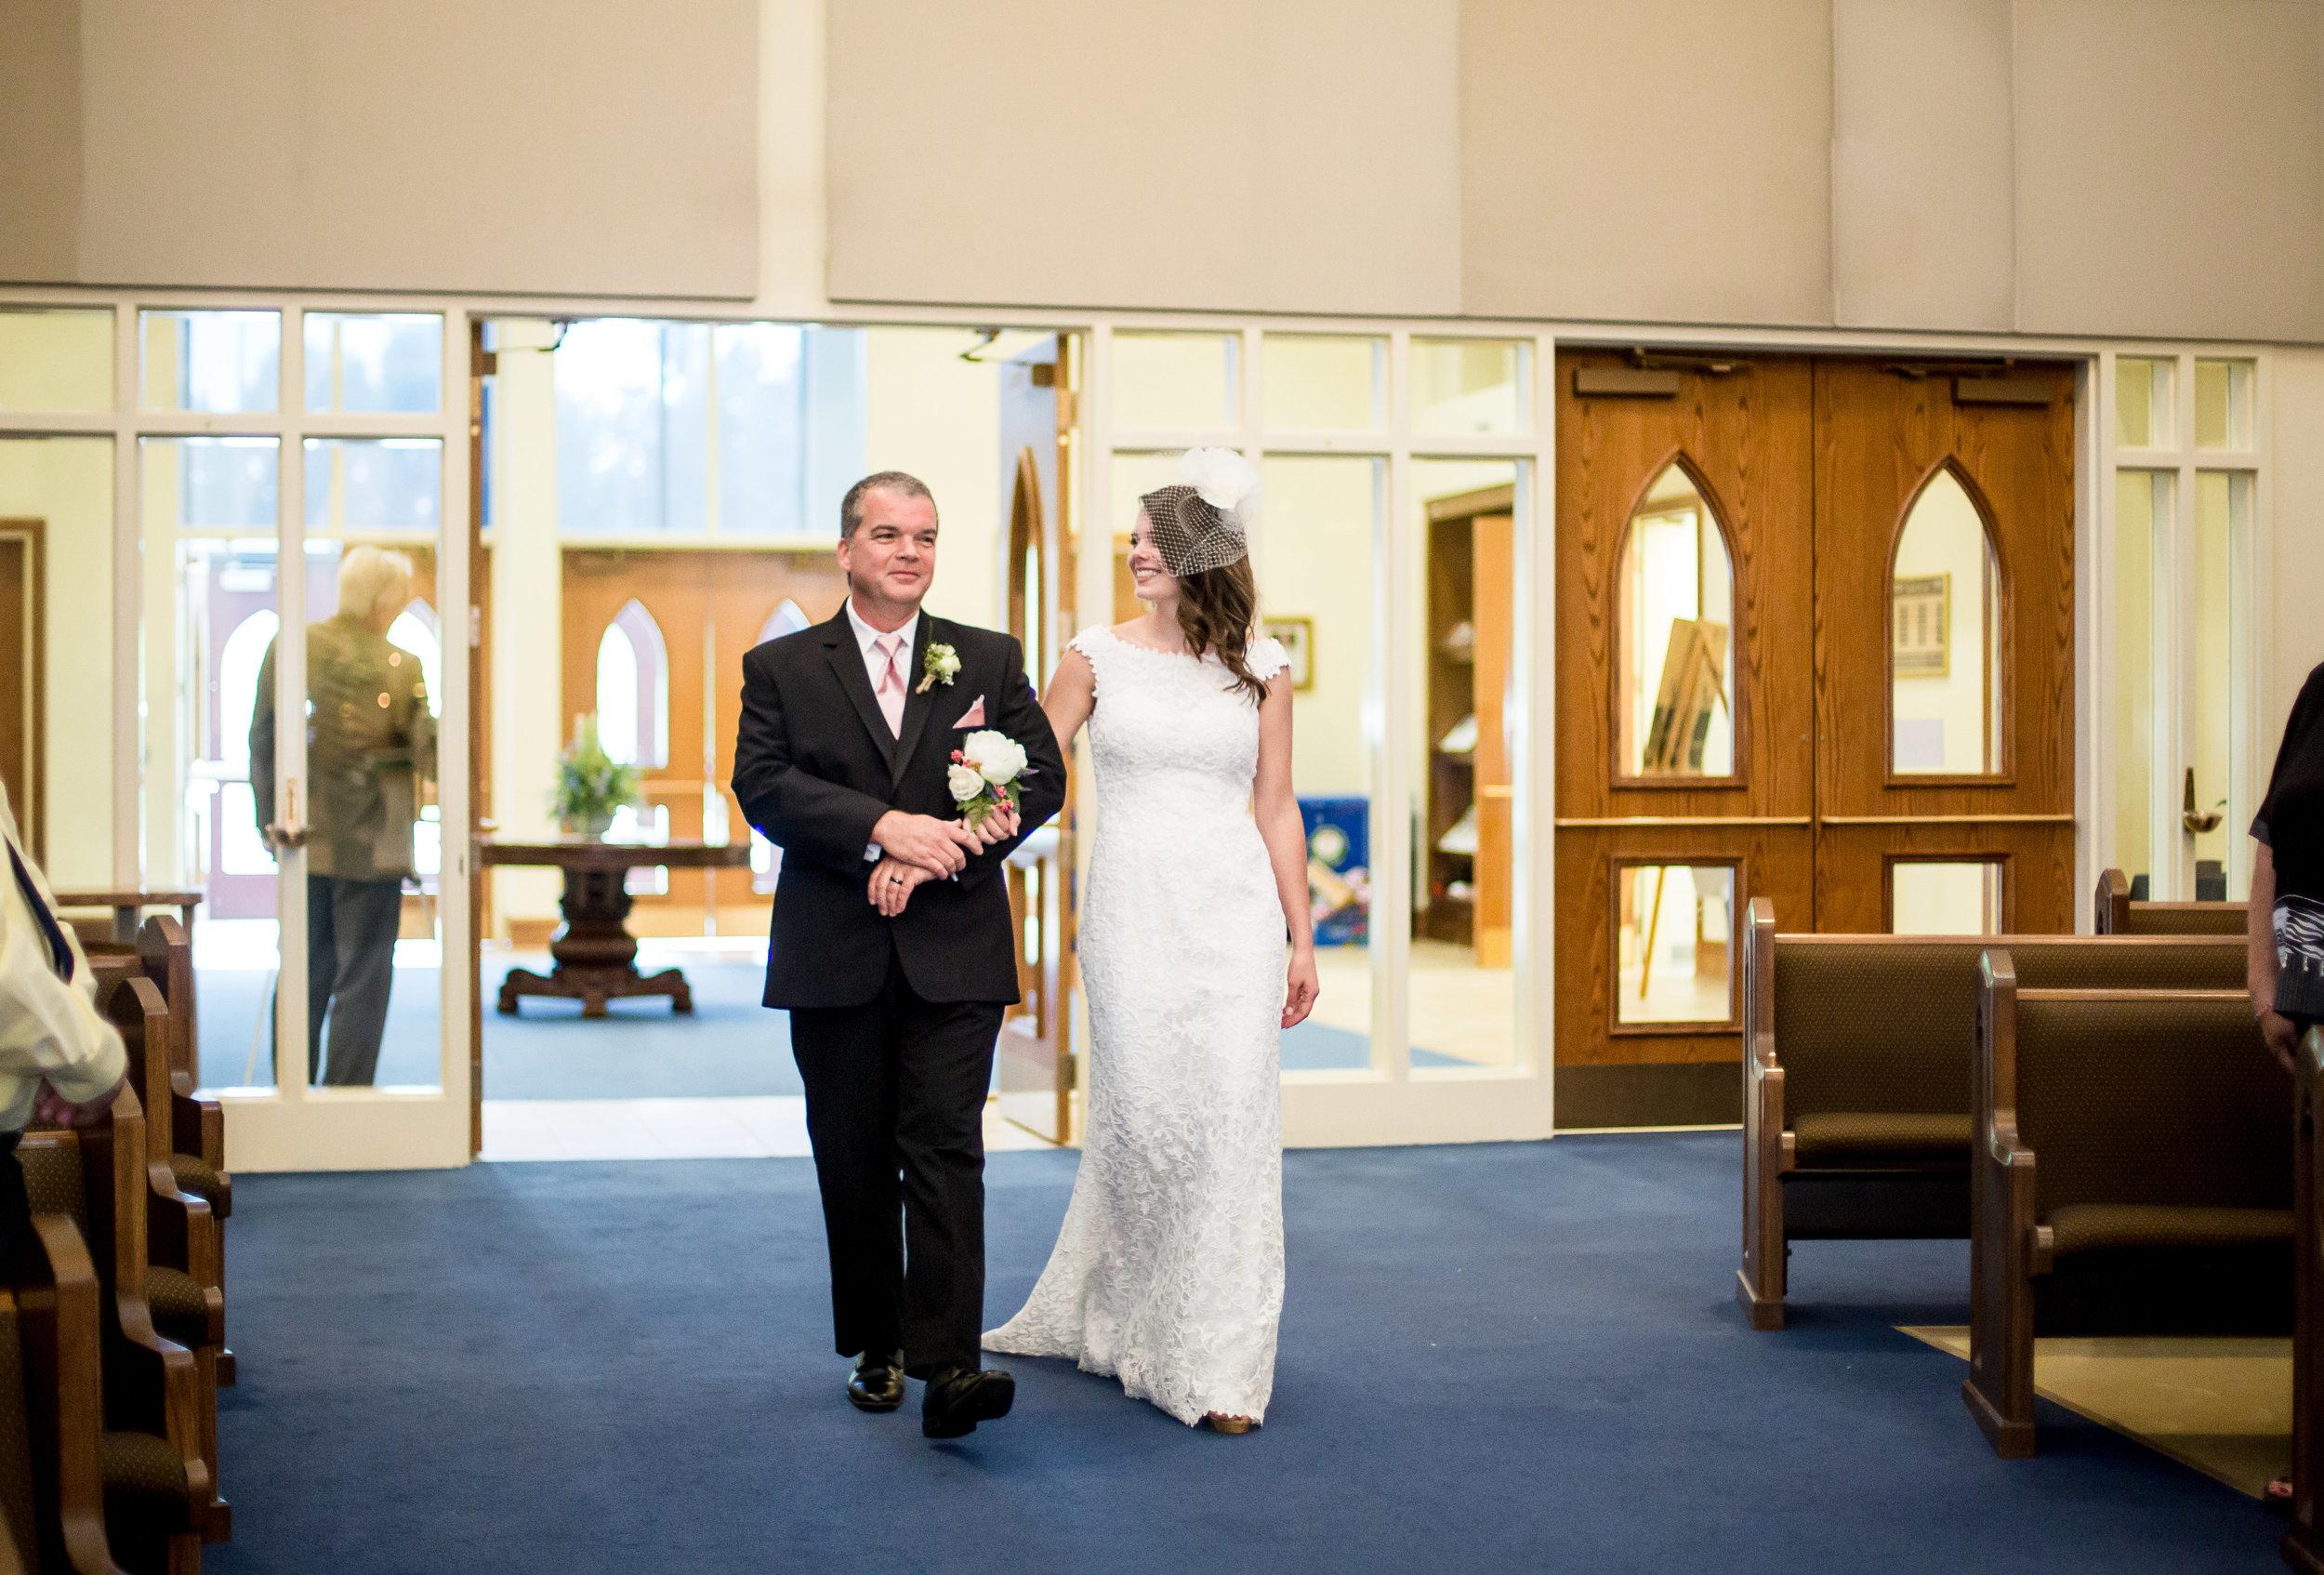 wedding (72 of 126).jpg